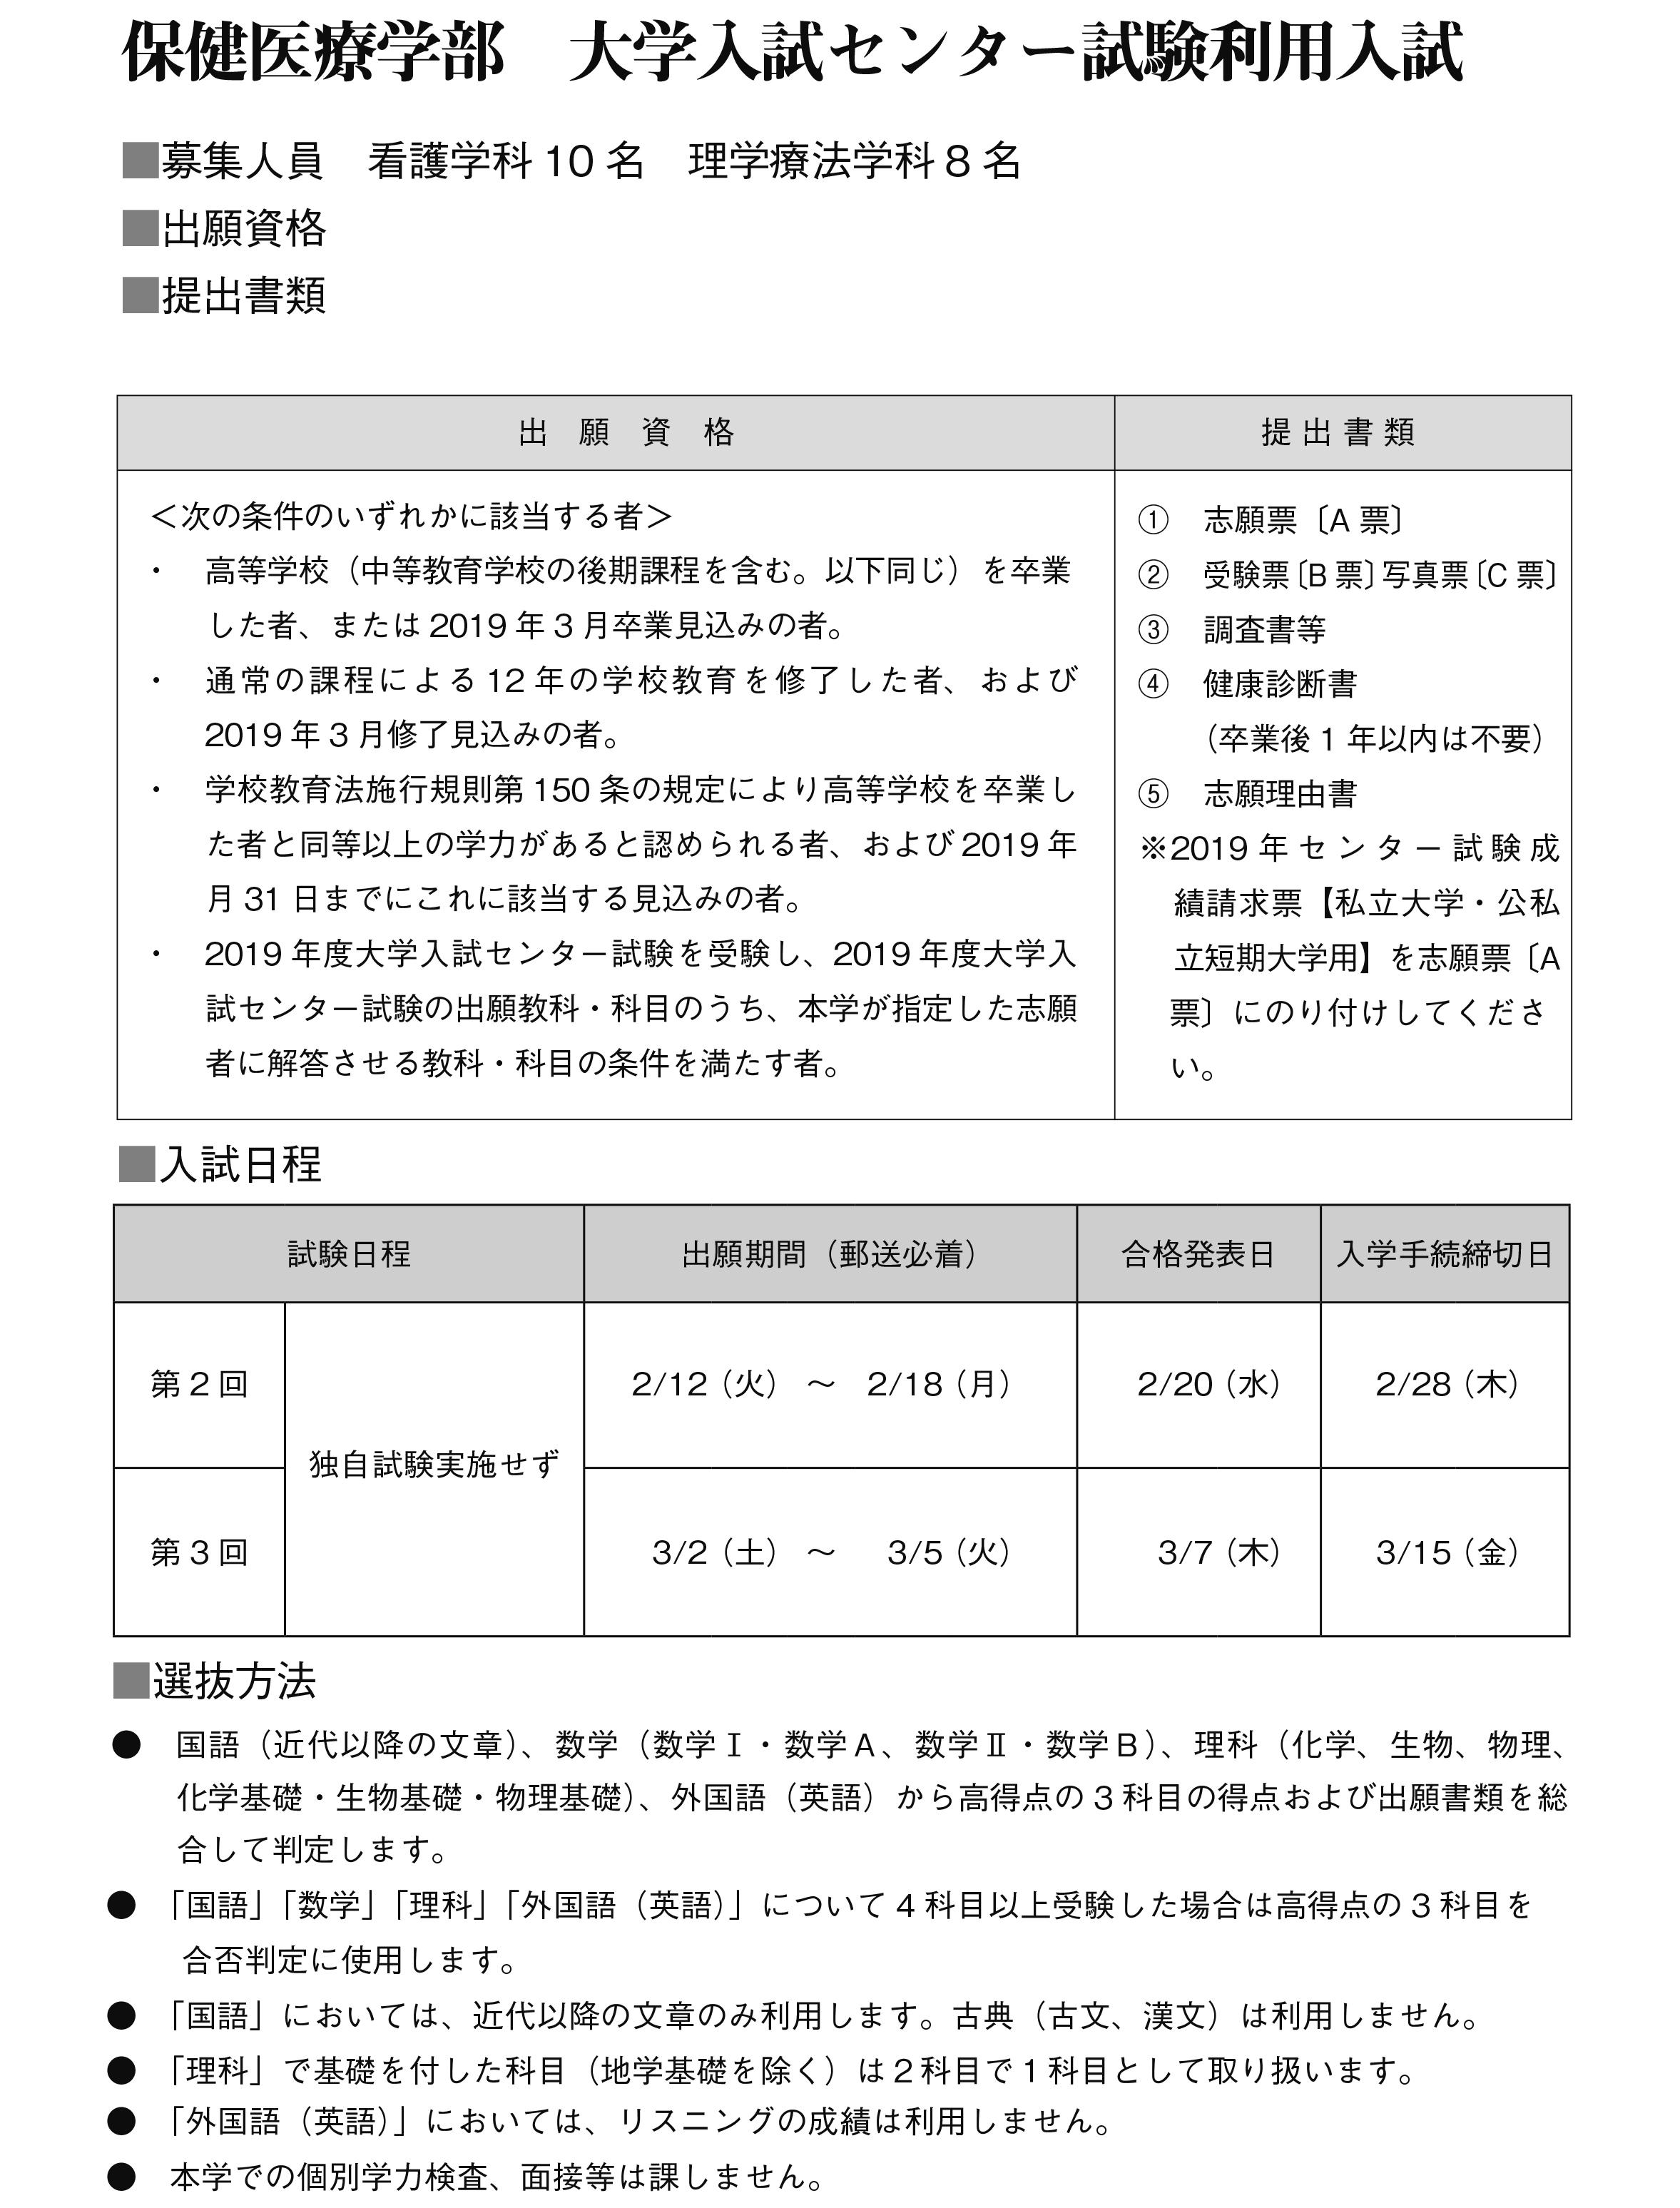 大学入試センター試験利用入試